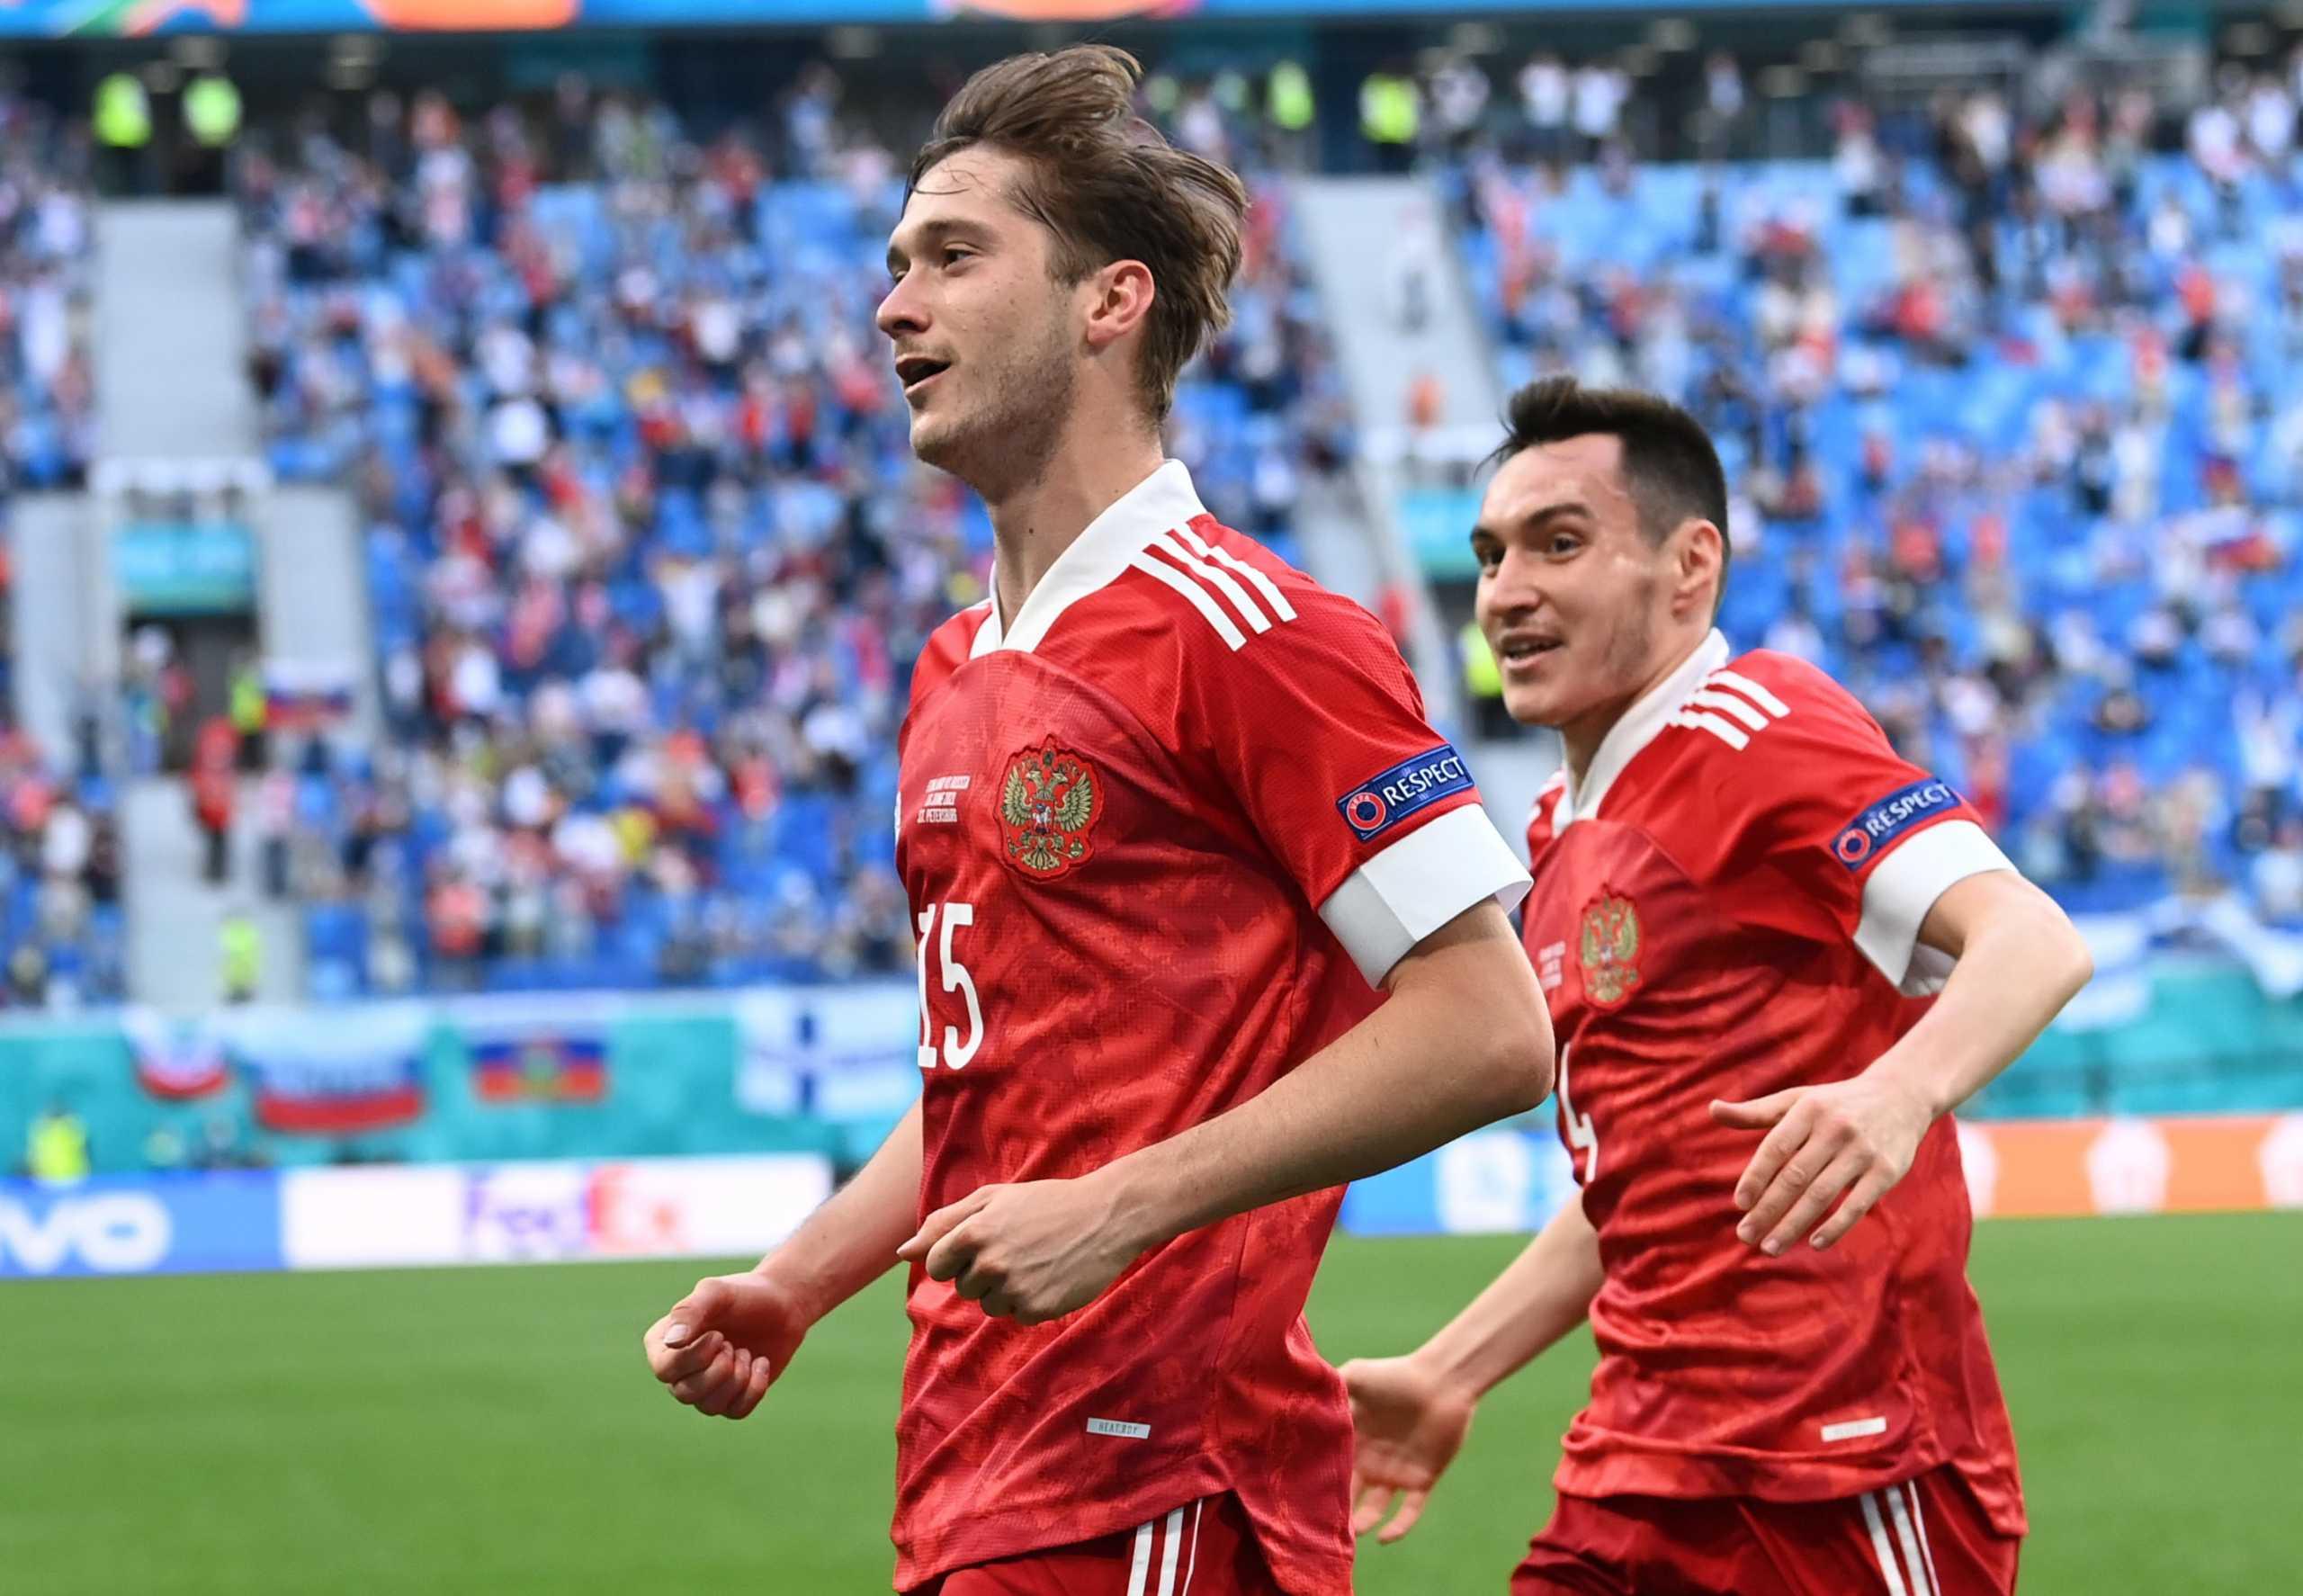 Euro 2020: Το ασύλληπτης ομορφιάς γκολ της Ρωσίας